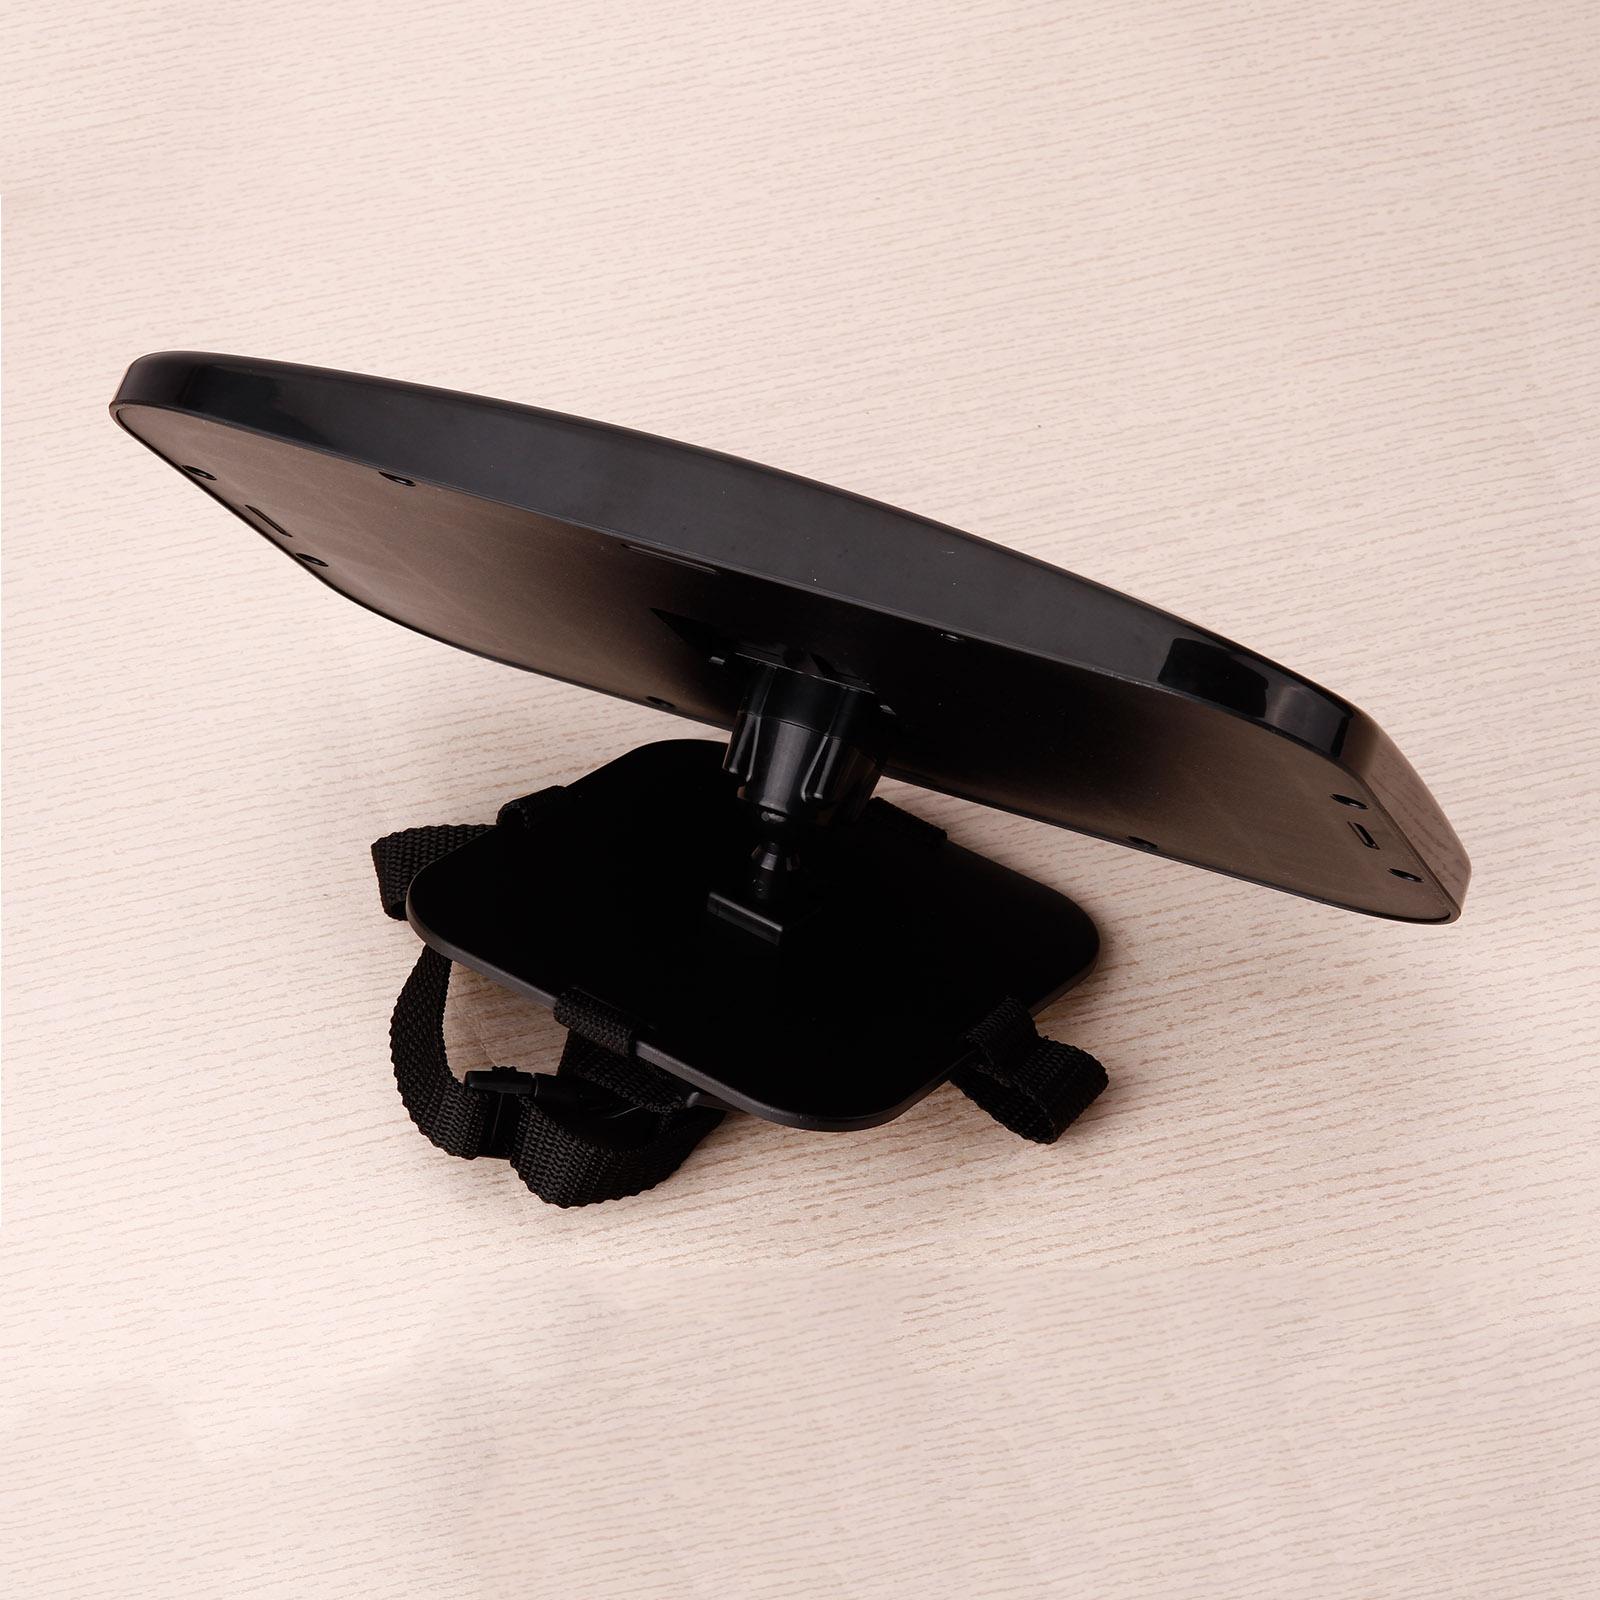 baby r ckspiegel kfz kinder spiegel autospiegel. Black Bedroom Furniture Sets. Home Design Ideas